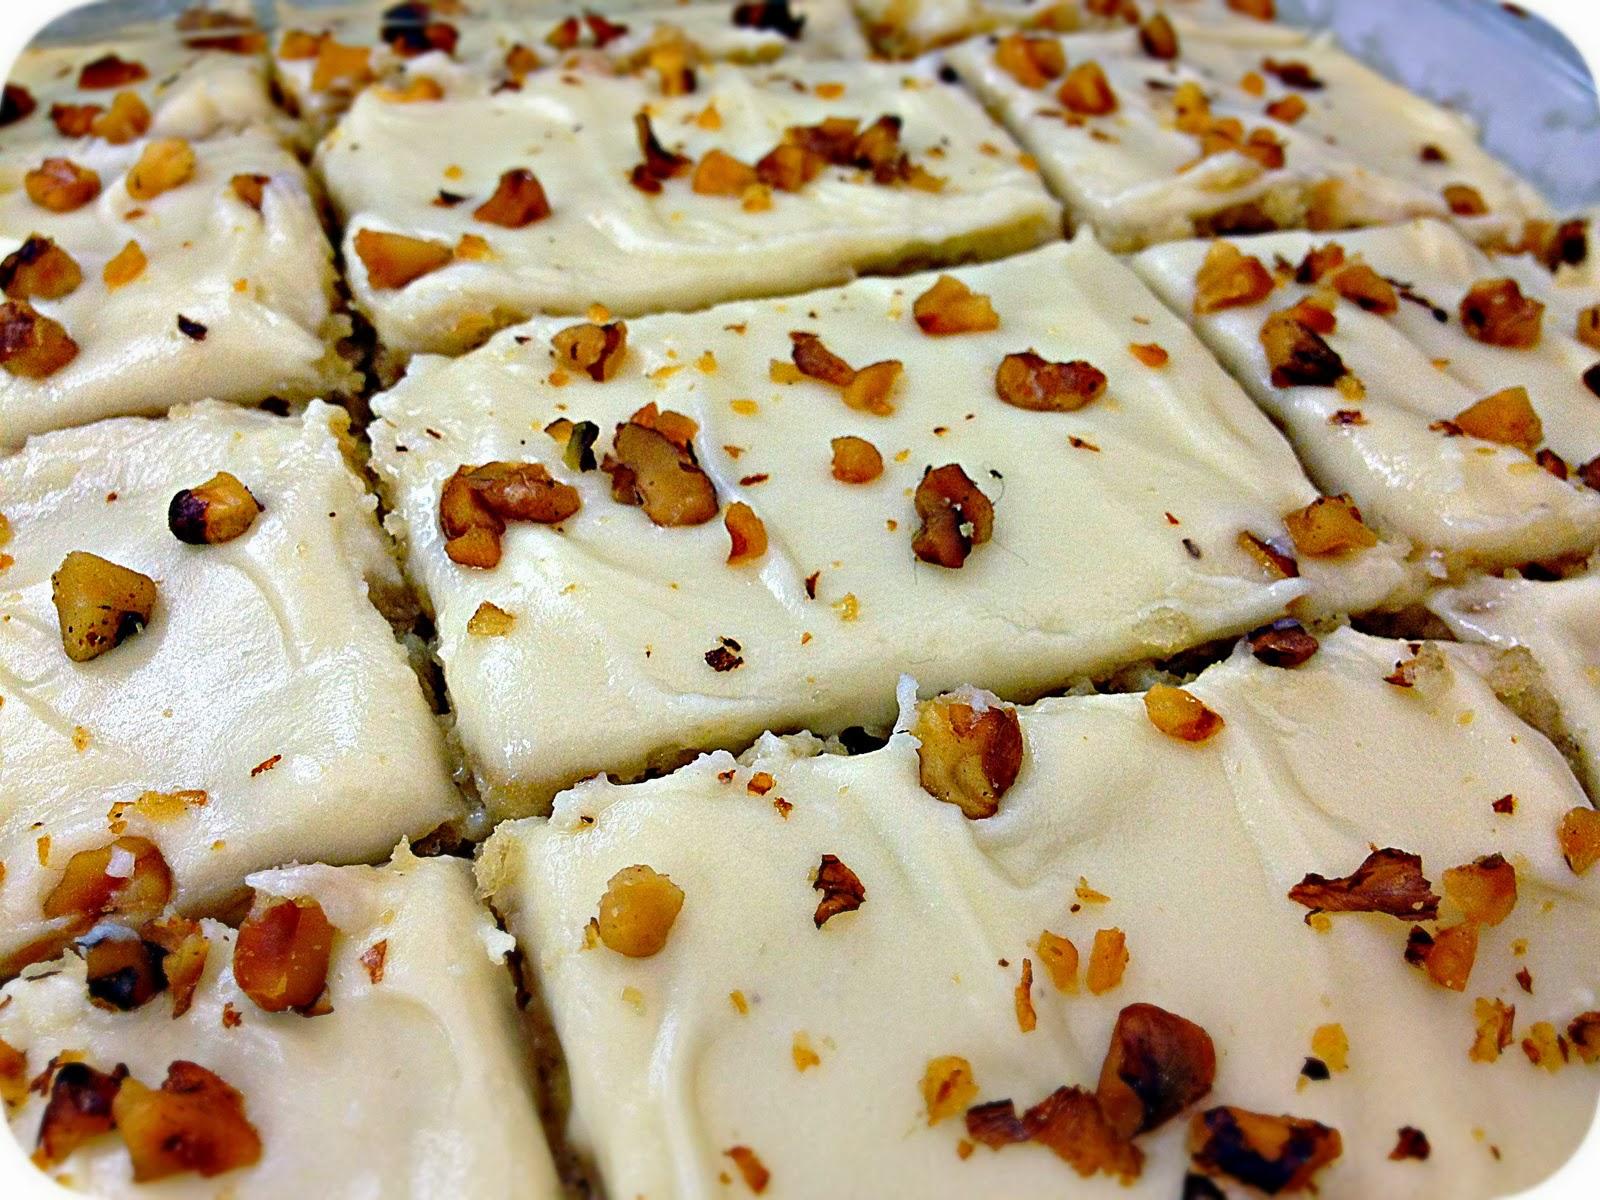 Resep Banana Cake Khas Jepang: Aneka Resep Masakan Internasional: Banana Cake With Cream